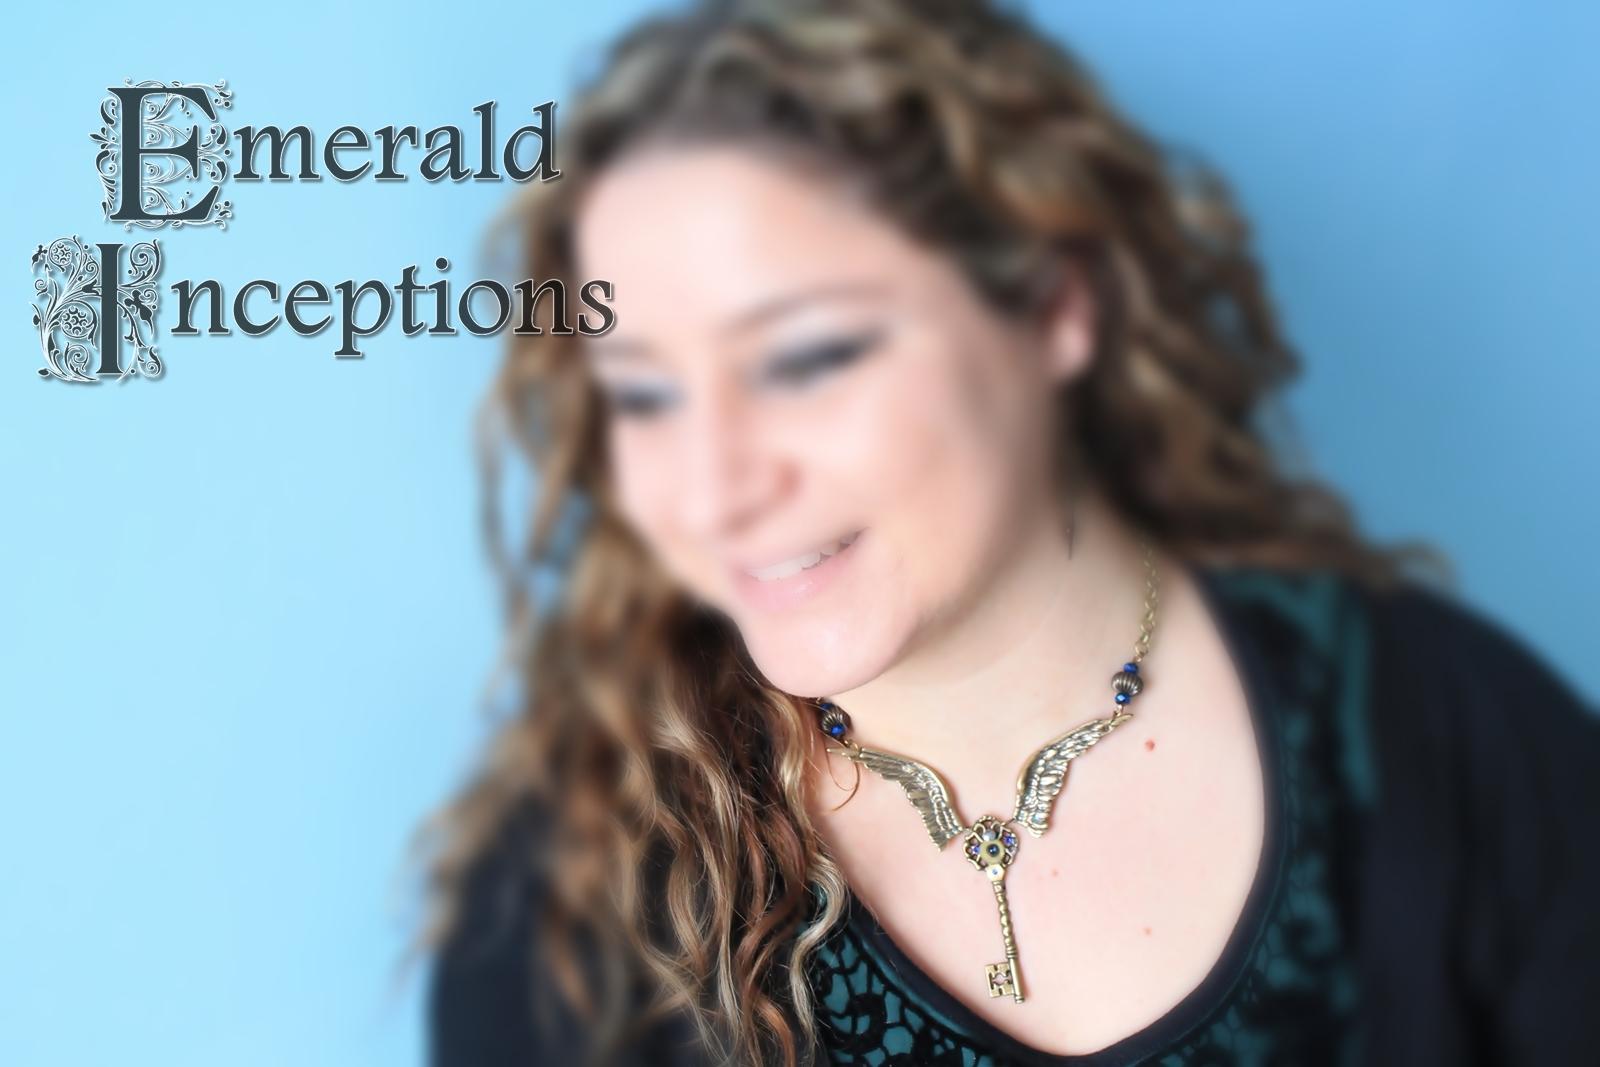 st_peters_stolen_key_steampunk_necklace_necklaces_2.JPG